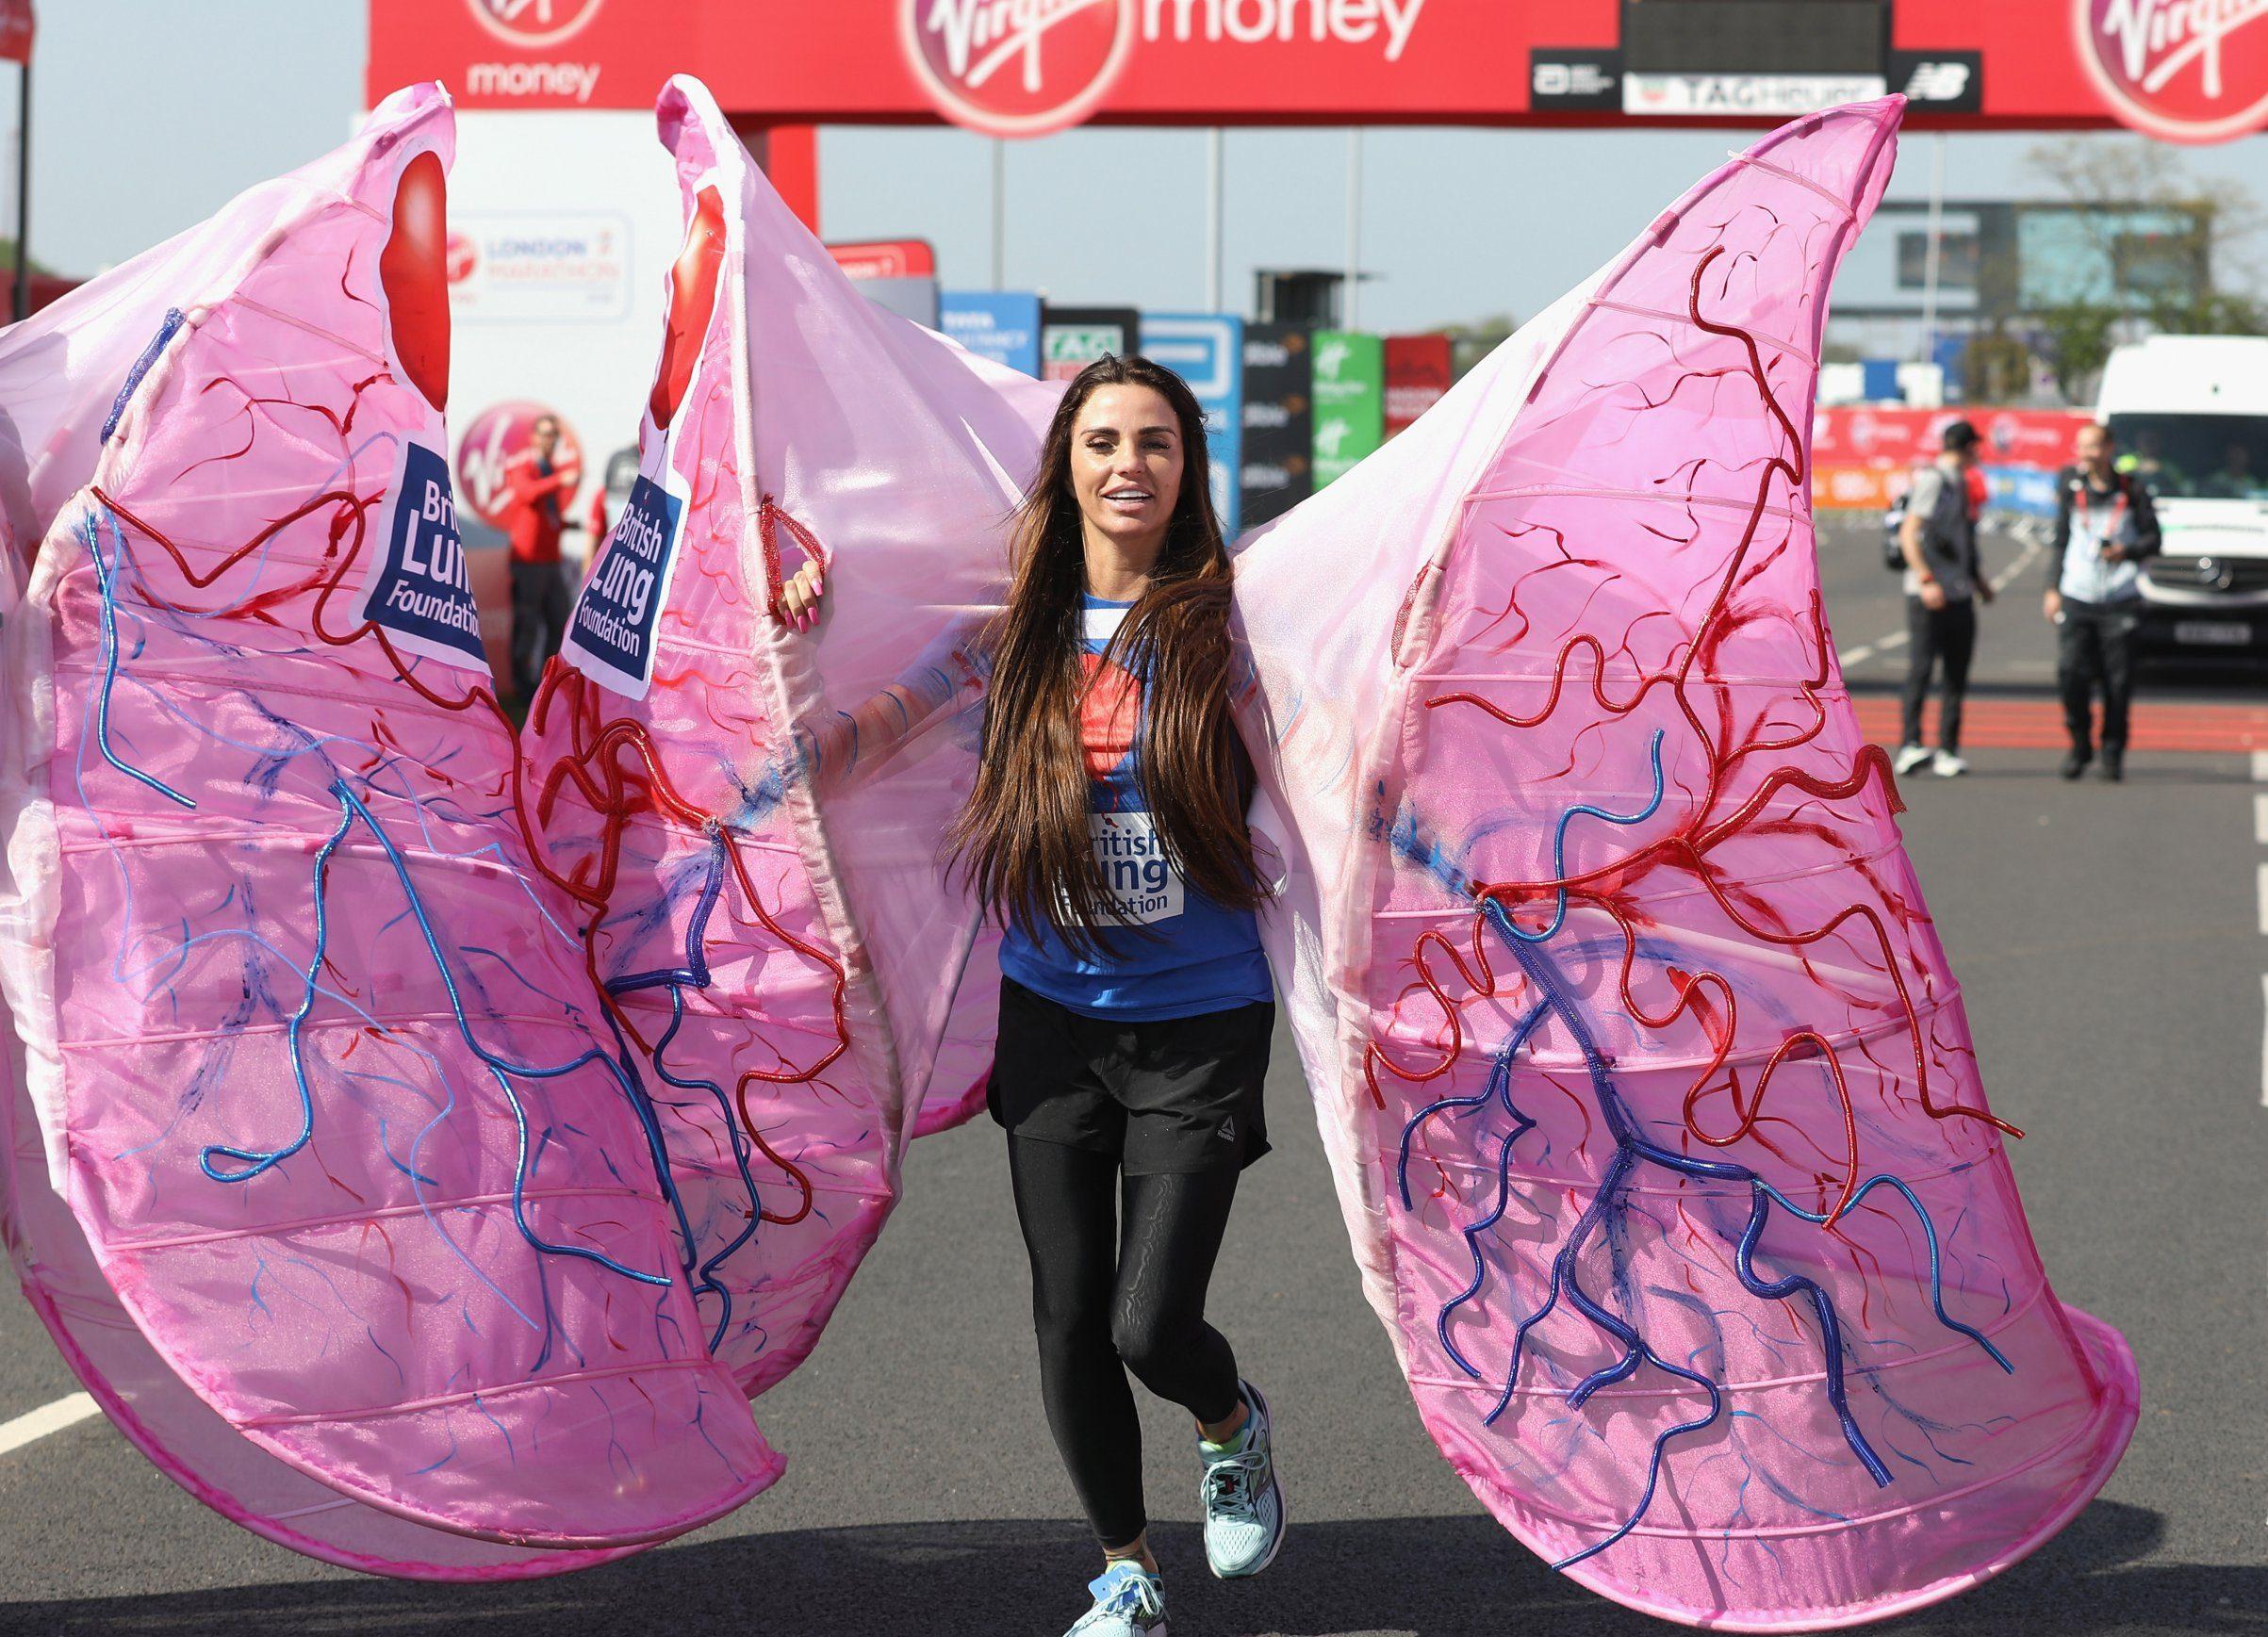 LONDON, ENGLAND - APRIL 22: Katie Price participates in The Virgin London Marathon on April 22, 2018 in London, England. (Photo by Tim P. Whitby/Tim P. Whitby/ Getty Images)